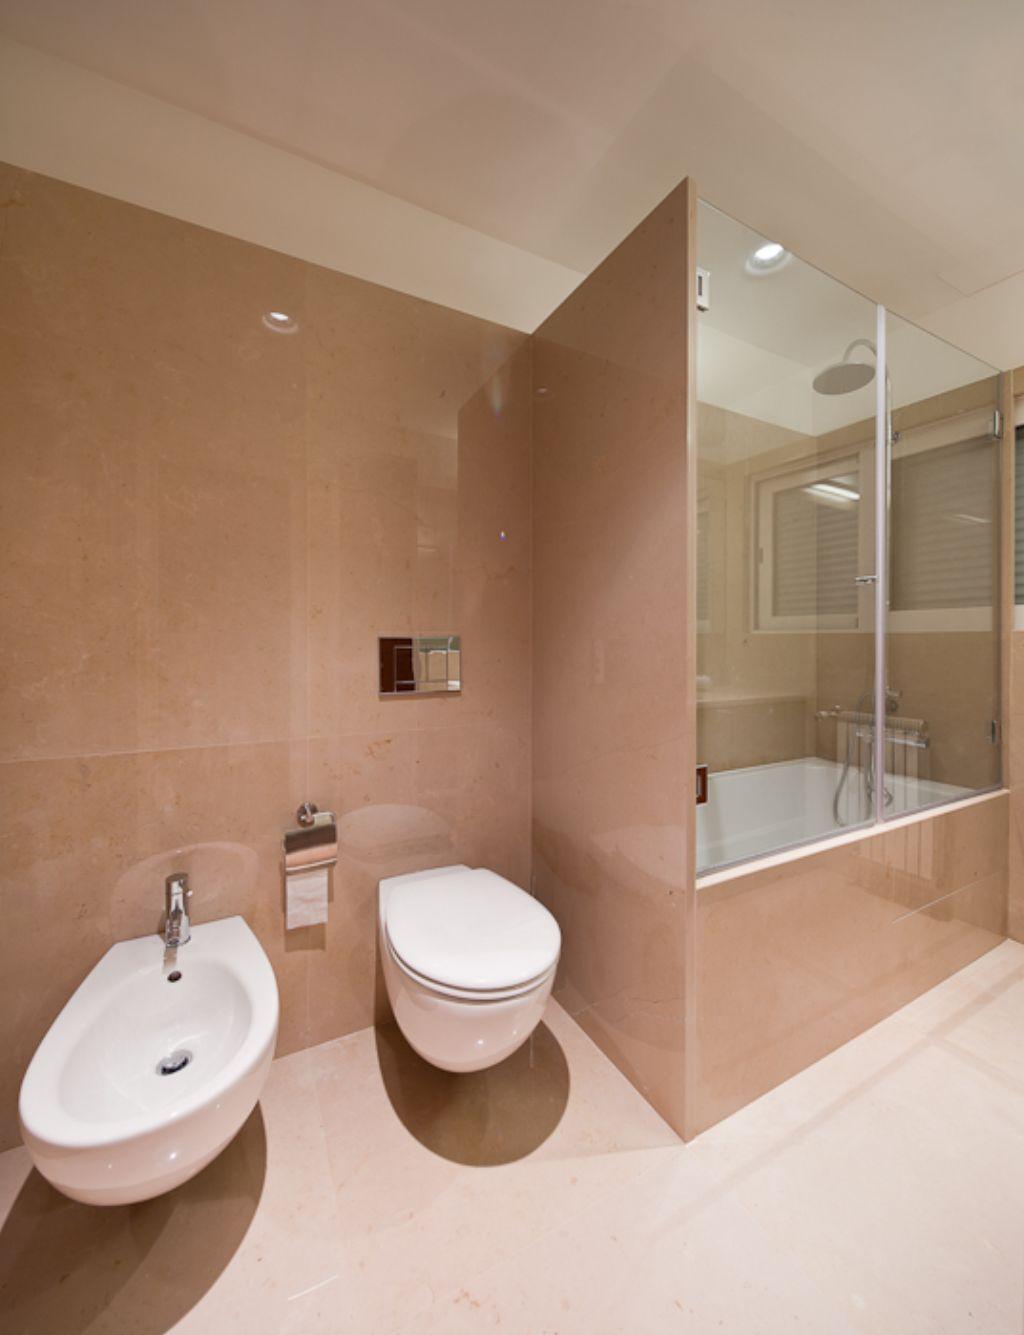 26 amazing pictures of traditional bathroom tile design ideas on Bathroom Ideas Apartment  id=21084